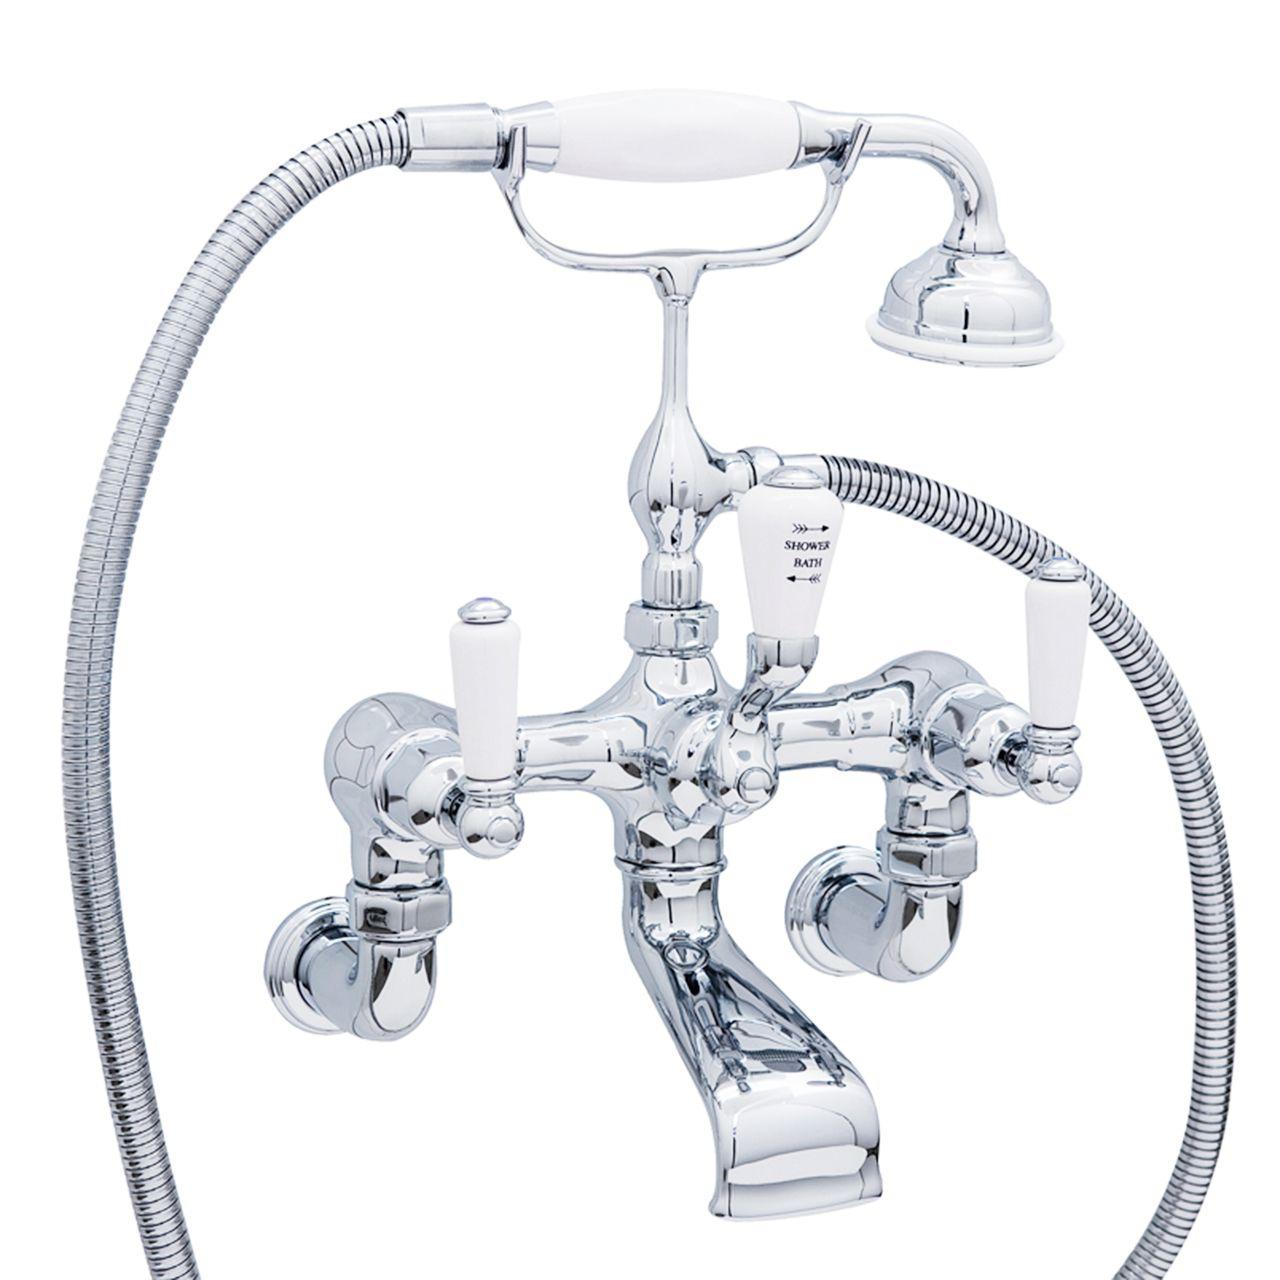 Bath Shower Mixer, Bath Shower Mixer Taps, Bath Taps